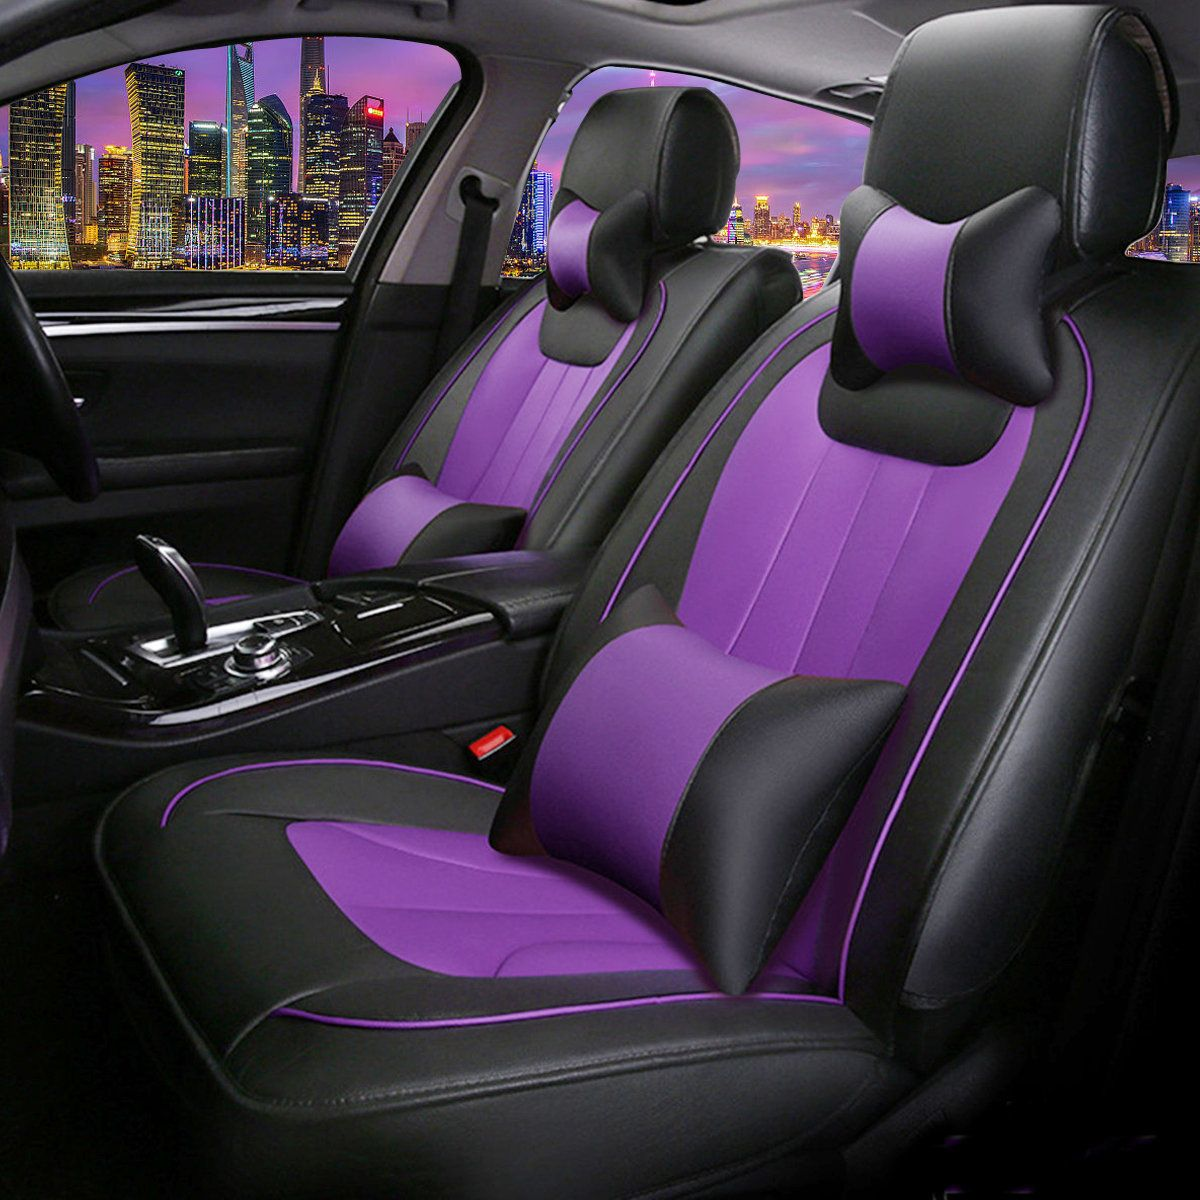 Black Purple Car Seat Cover Pu Leather 5 Seats Full Set Front Rear Auto Cushion Car Seatcovers Pur Purple Car Leather Car Seat Covers Car Seat Cover Sets